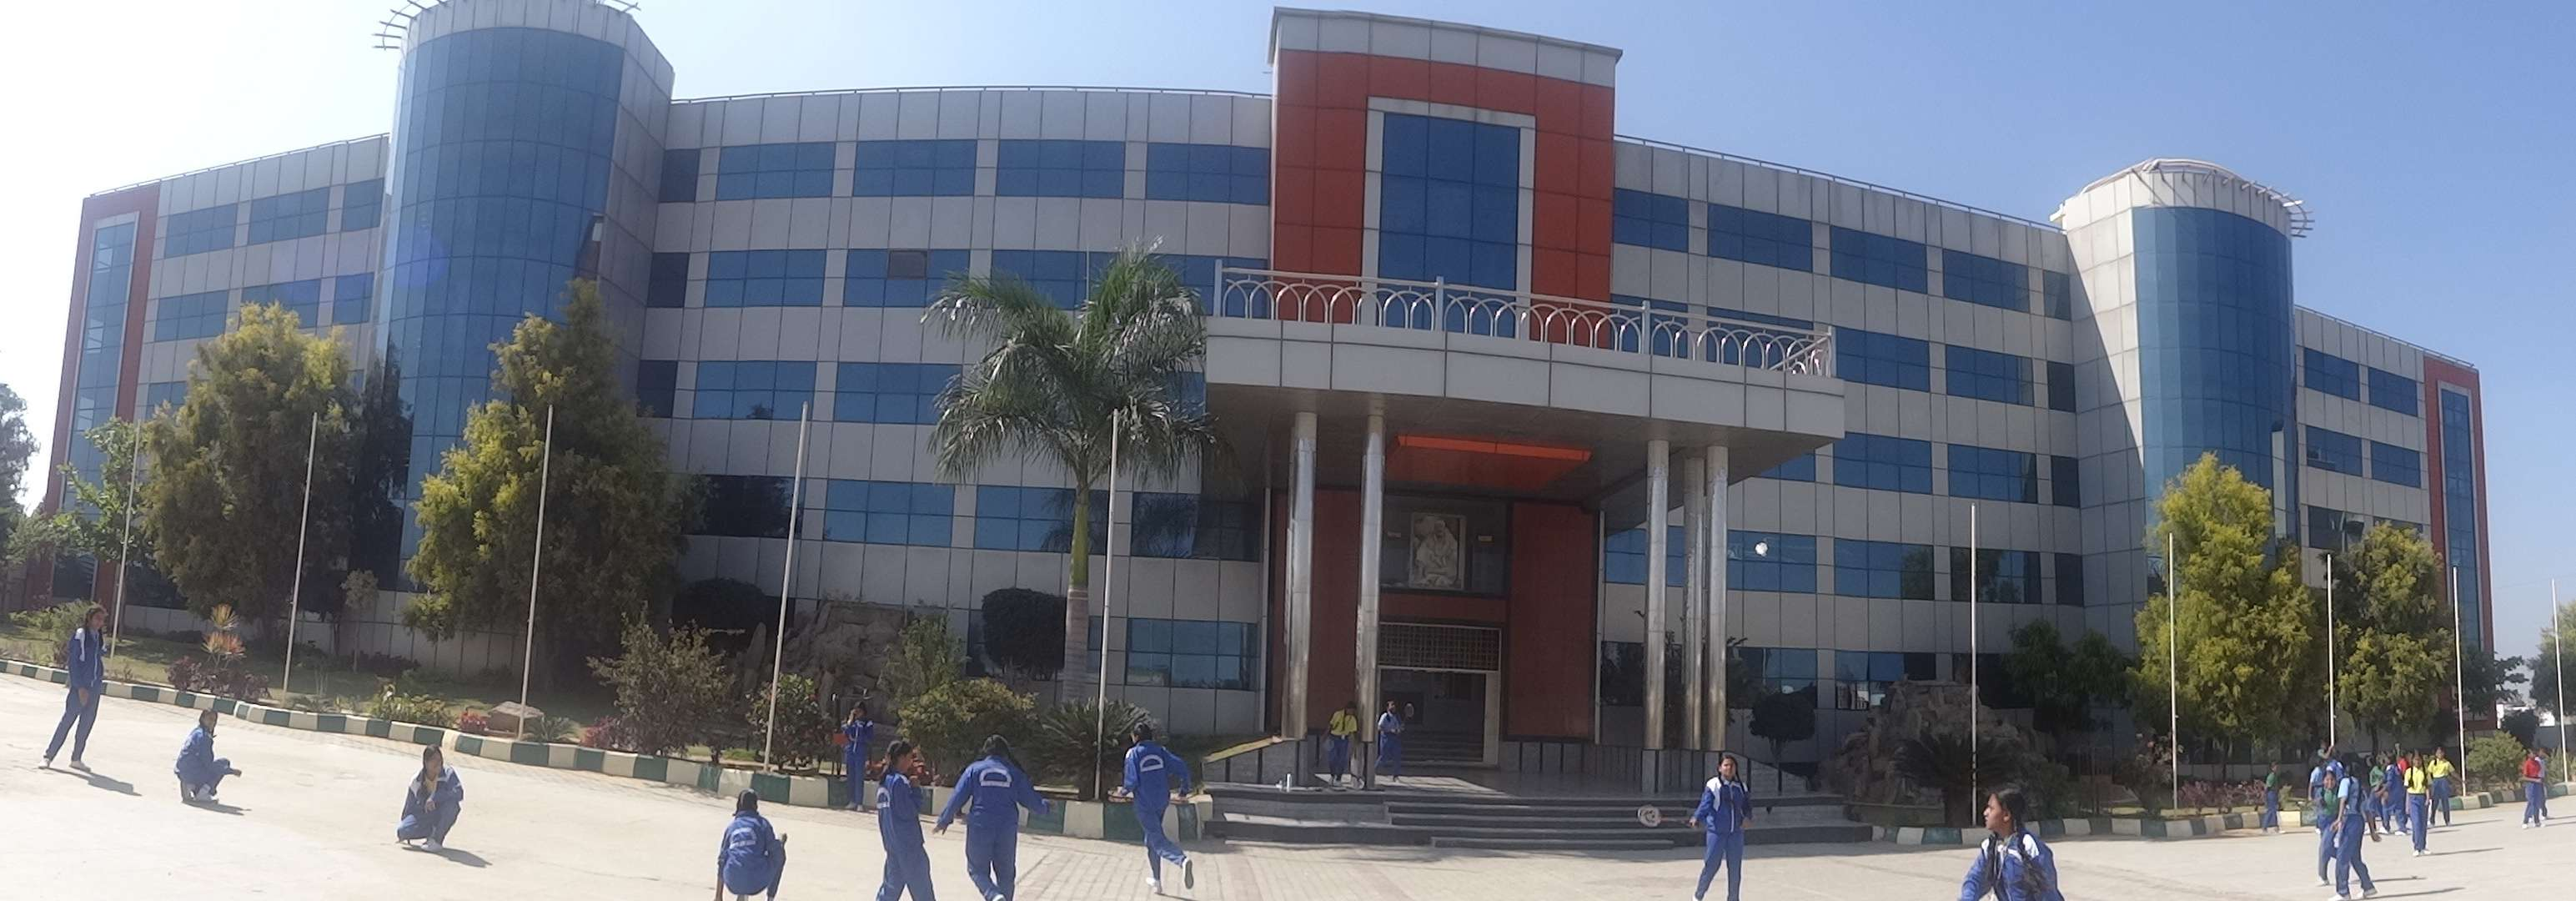 SADHGURU SAINATH INTERNATIONAL SCHOOL SY NO 165 KUDLU VILLAGE MADIWALA POST HOSUR ROAD 830251